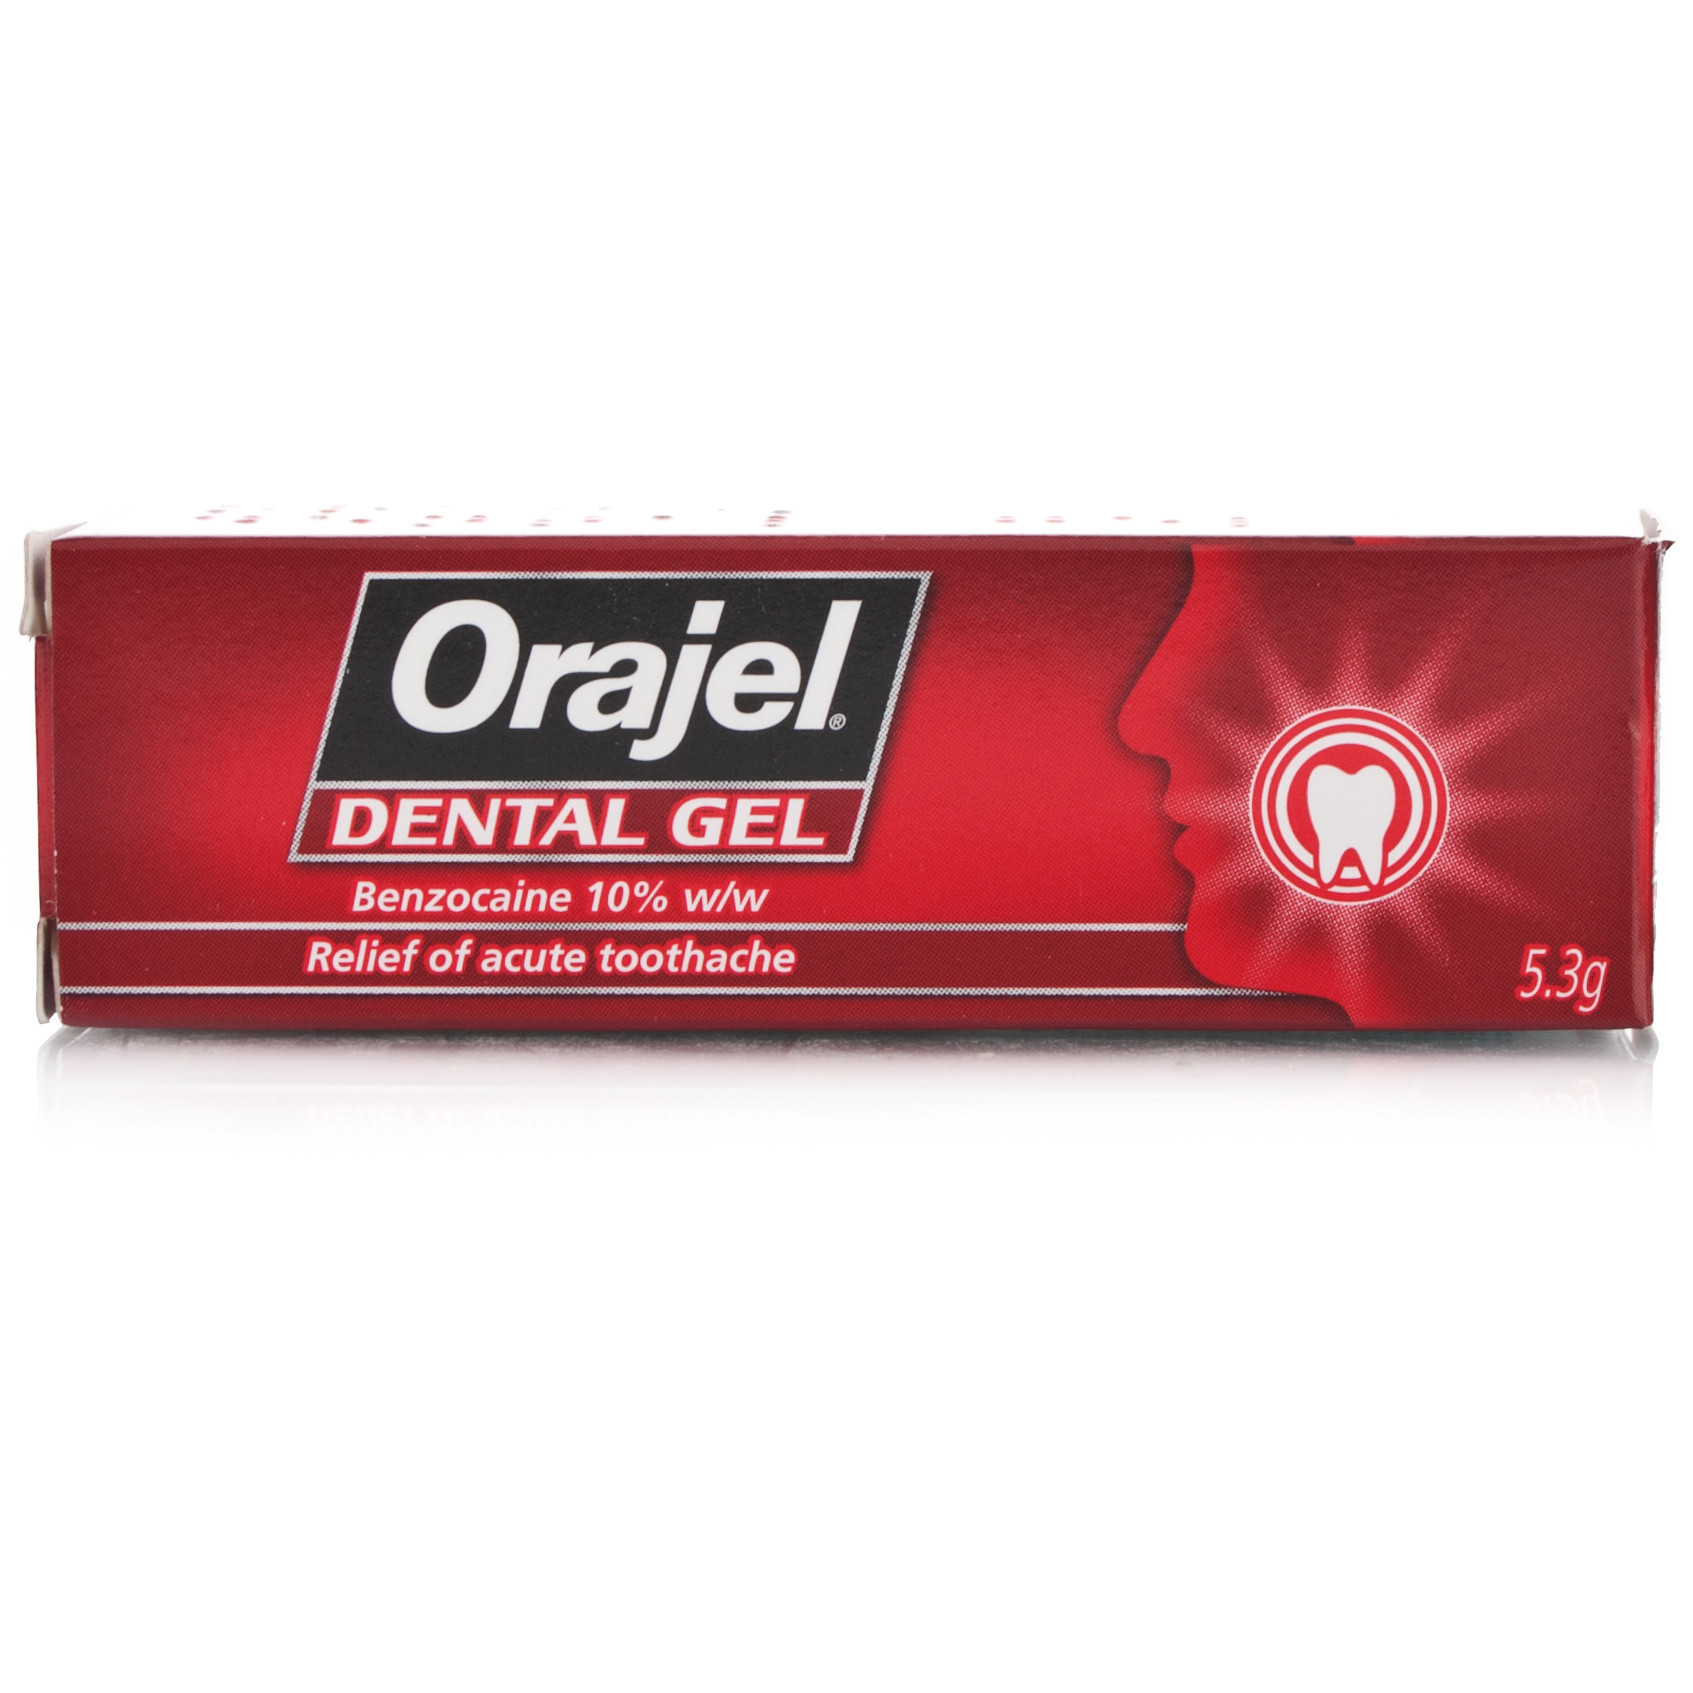 Oral Jel Ordinary Nude Teen Pics